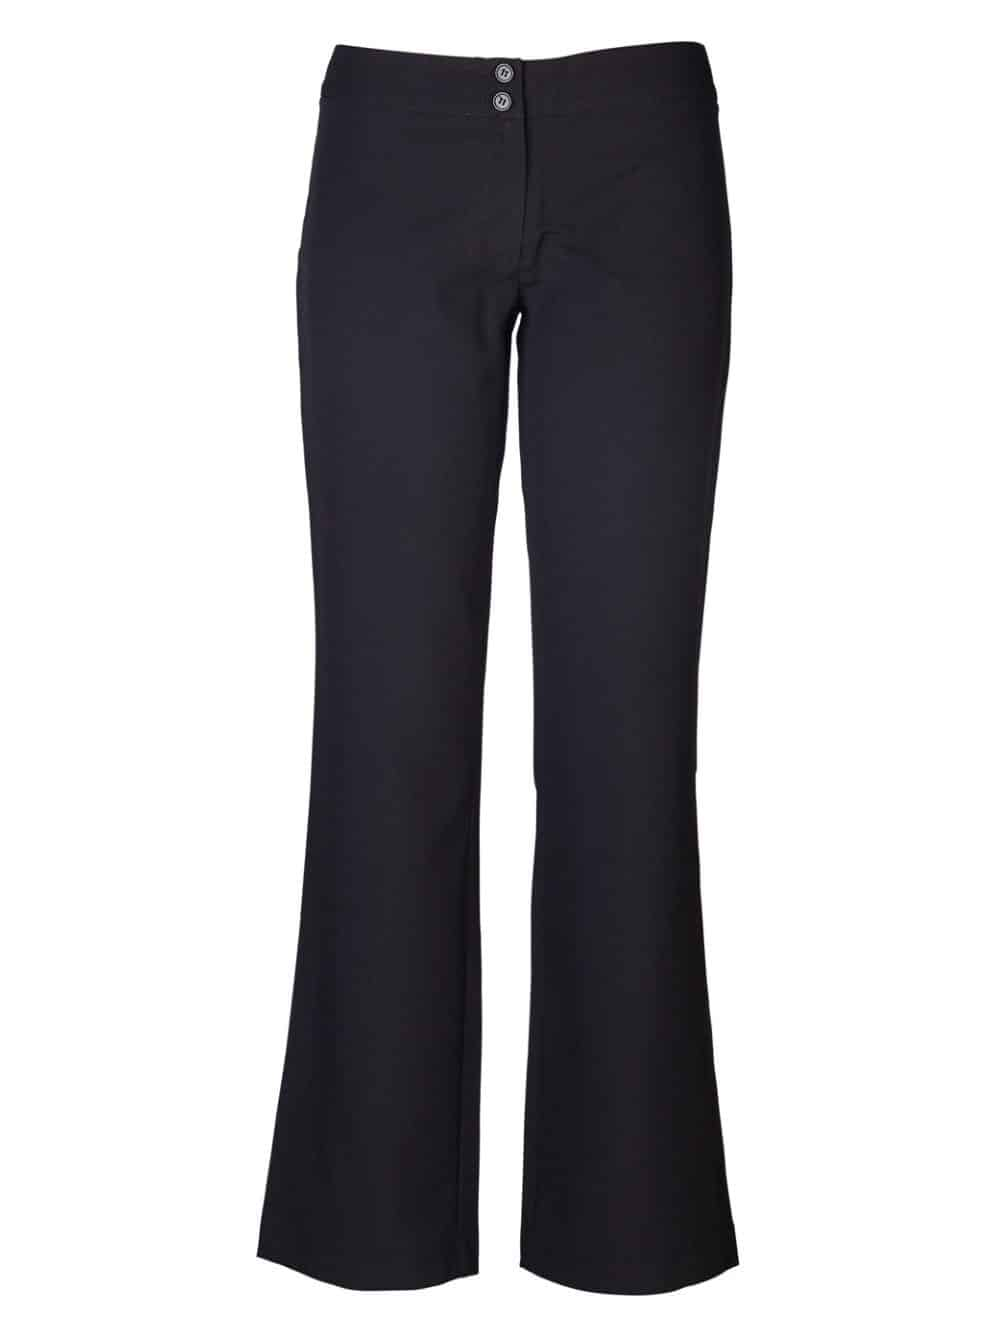 Ladies Susan Hipster Pants Formal Wear